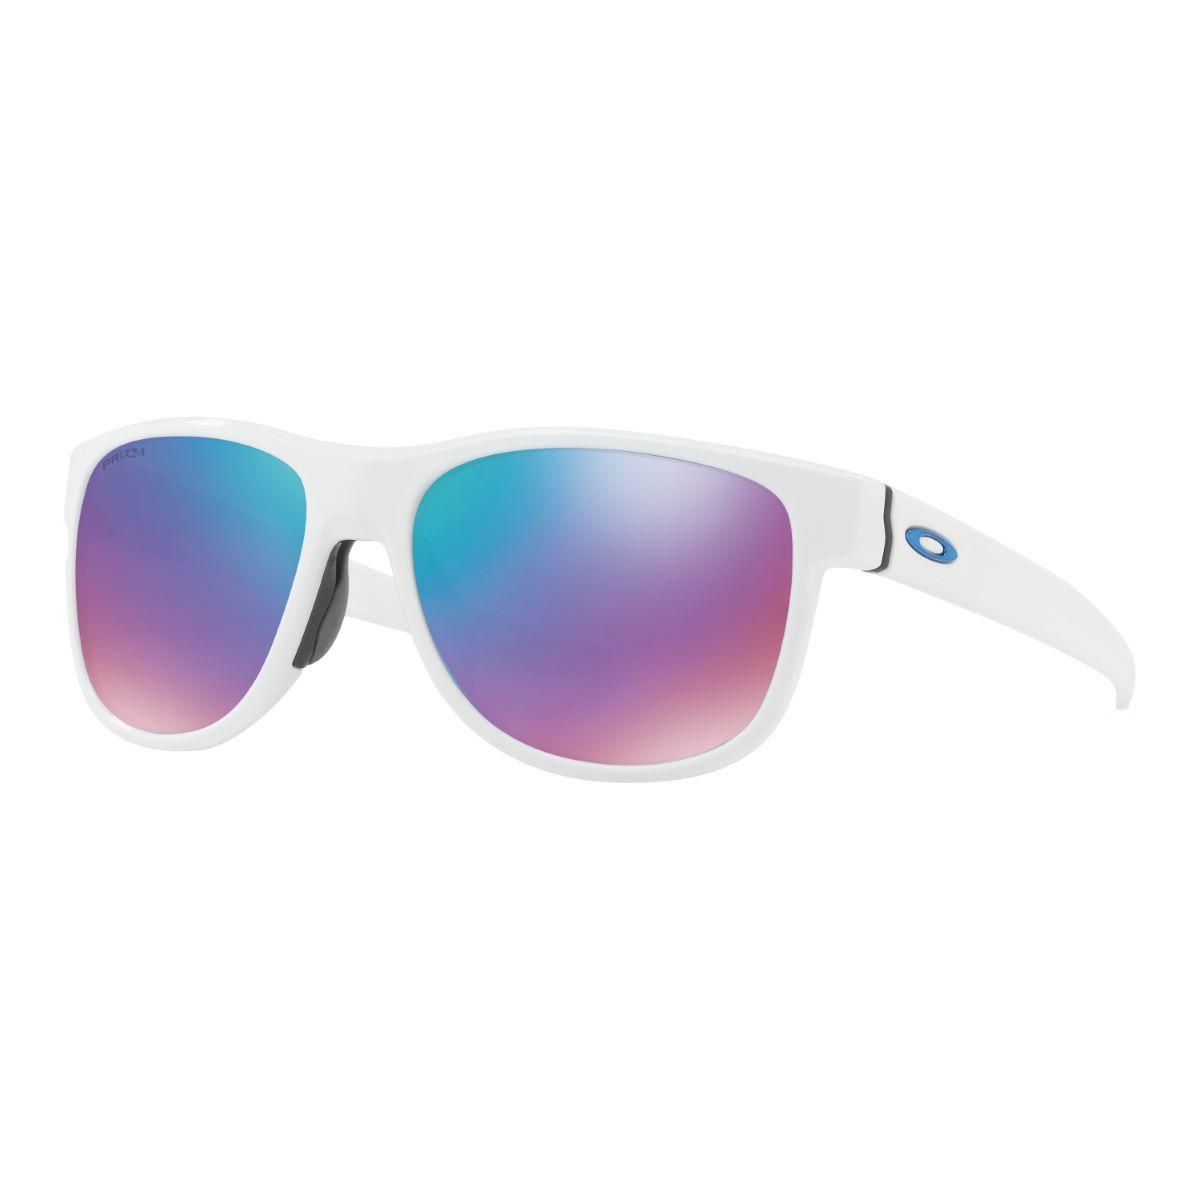 Oakley Crossrange Prizm Snow Sunglasses Sunglasses